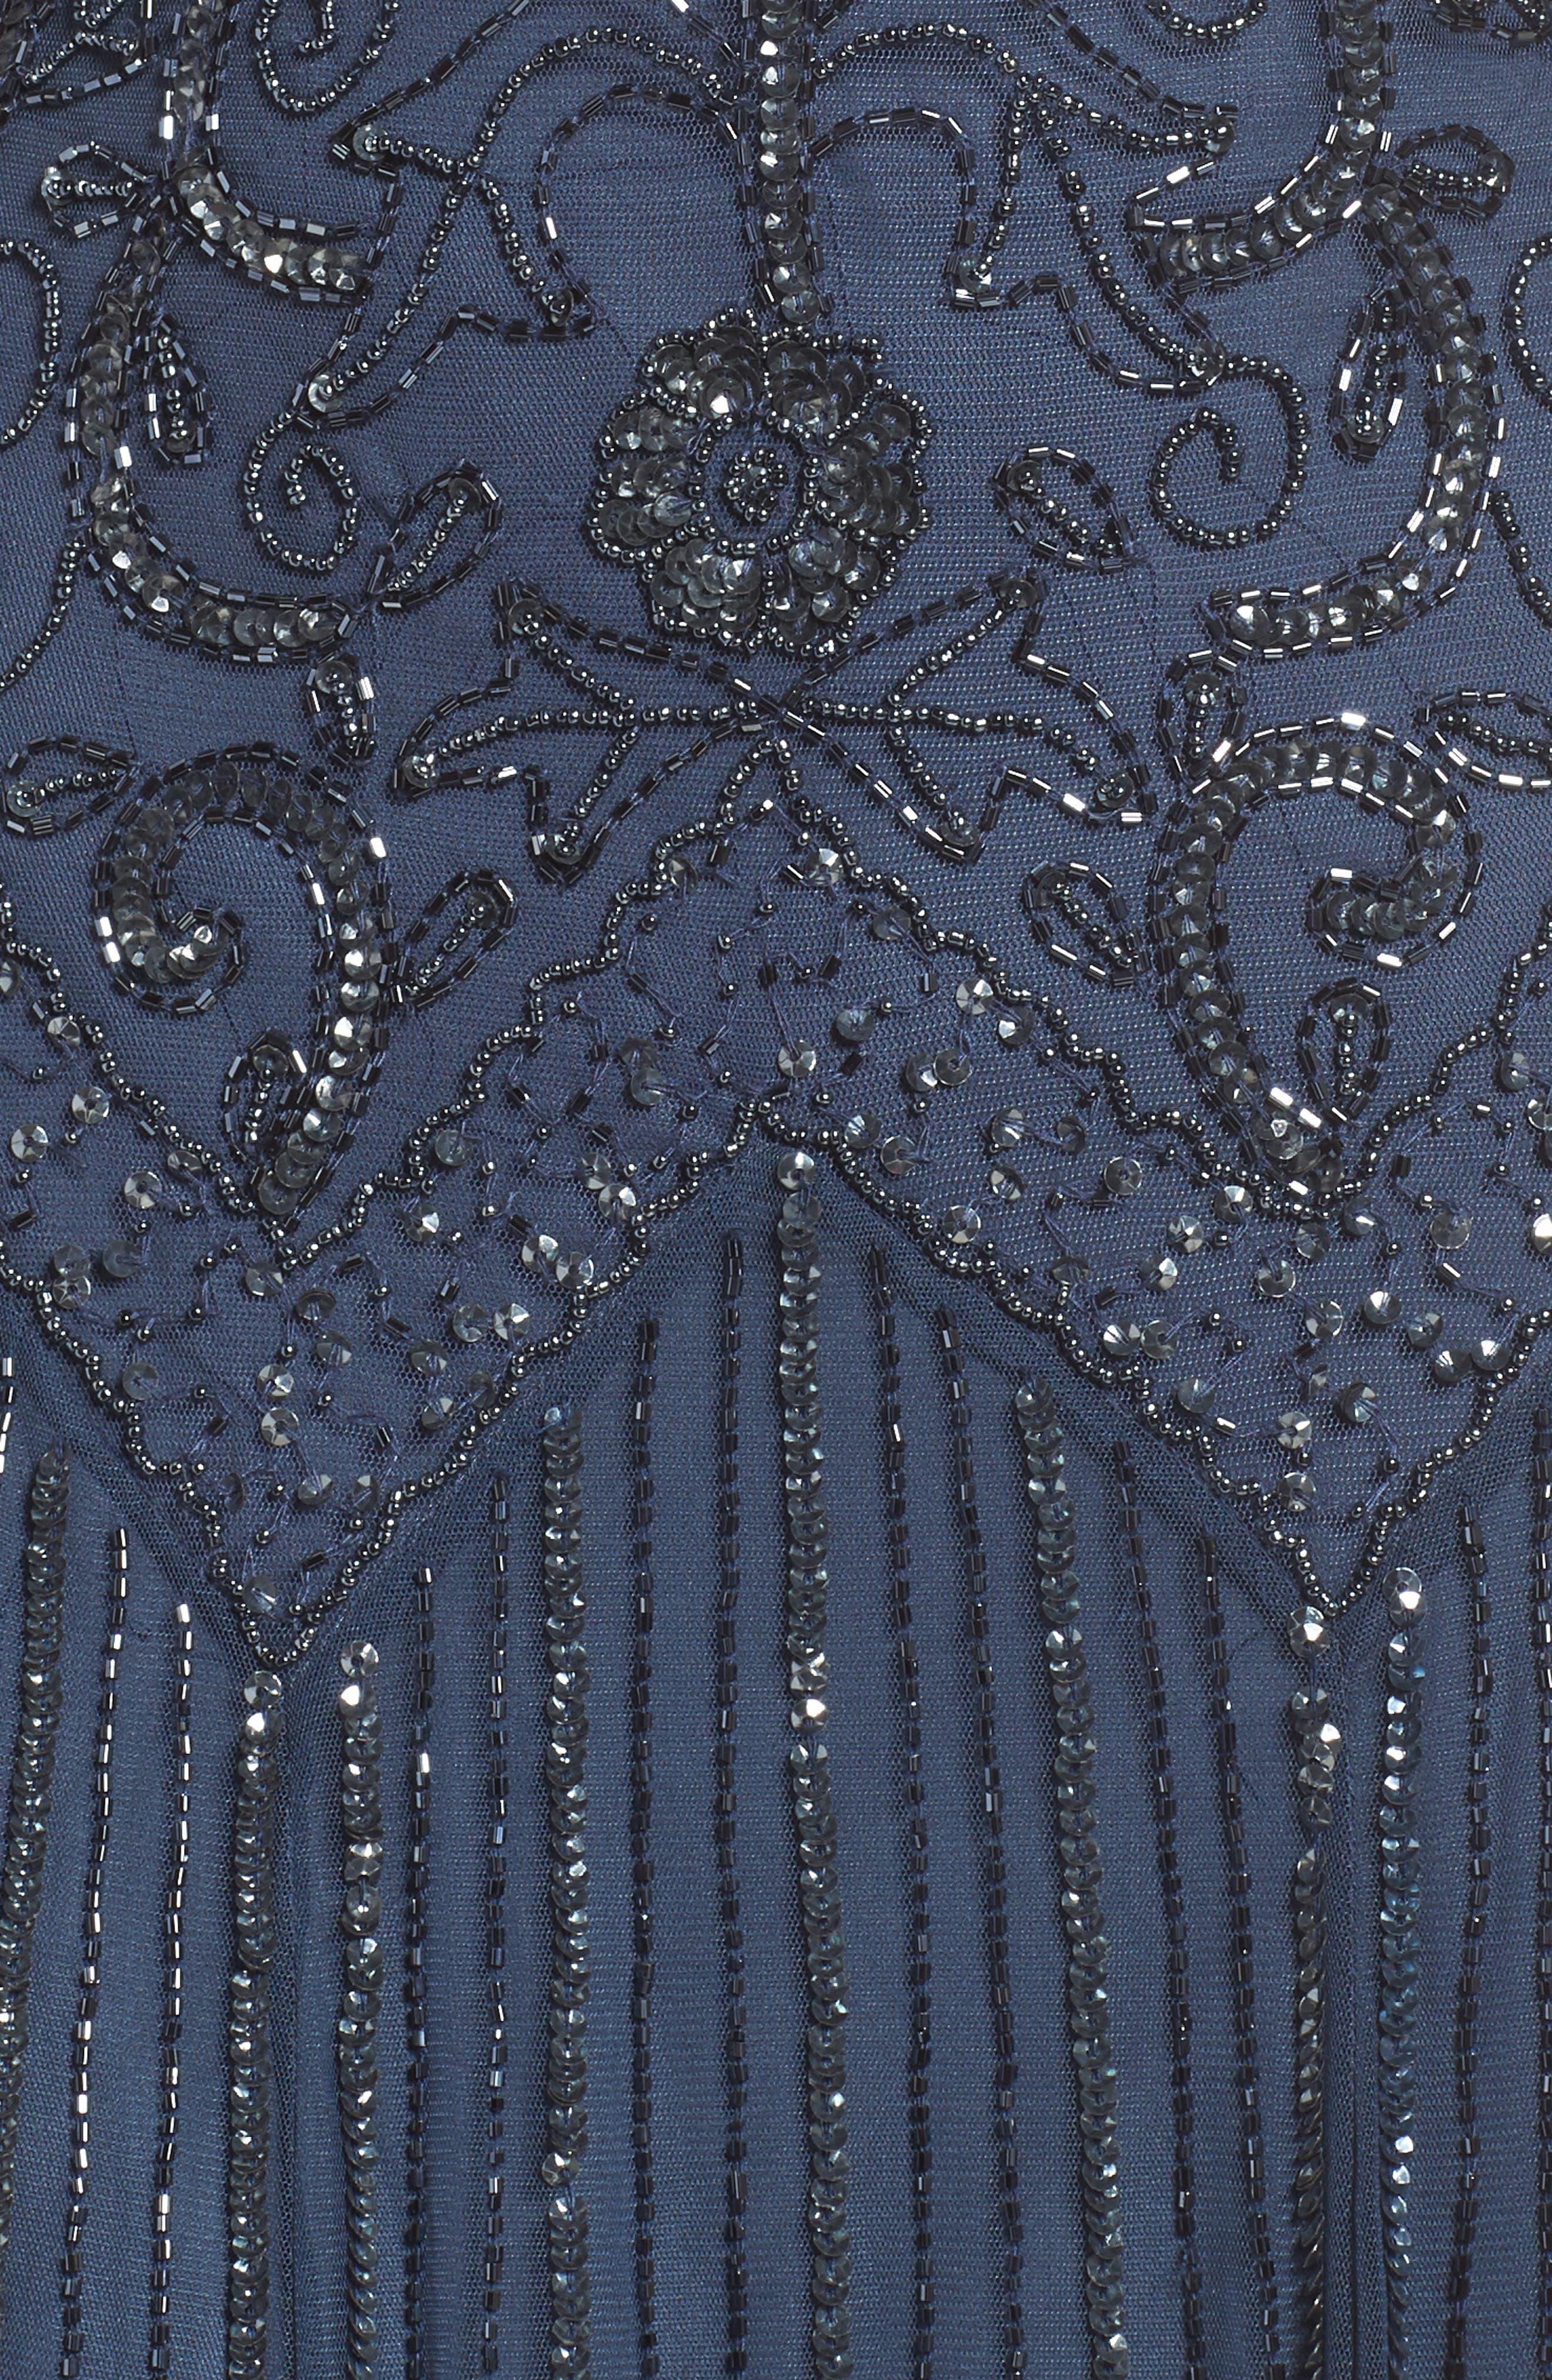 Beaded Mesh Tea Length Dress,                             Alternate thumbnail 5, color,                             450